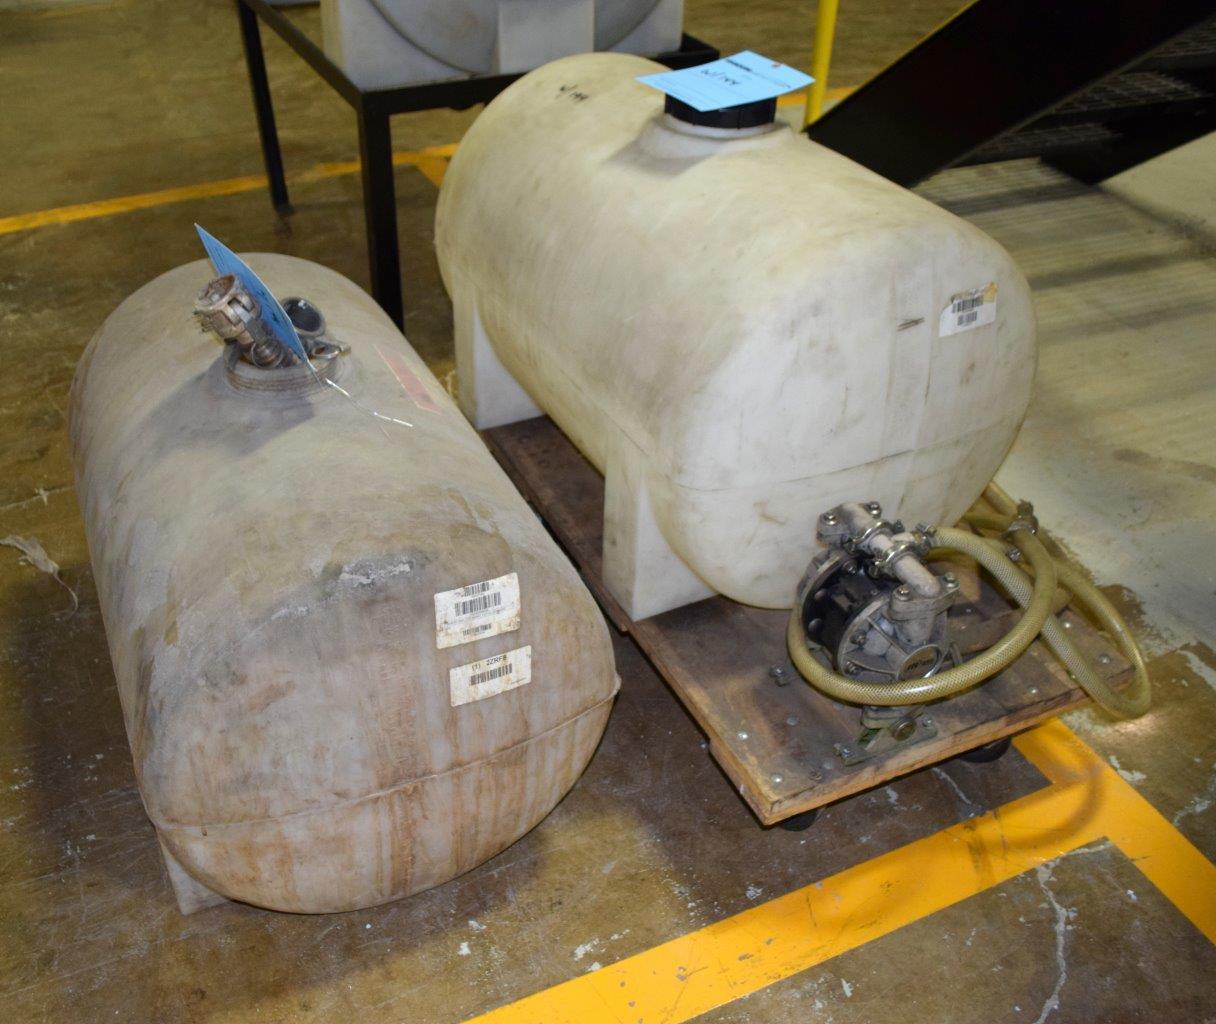 Lot 144 - Plastic Tanks